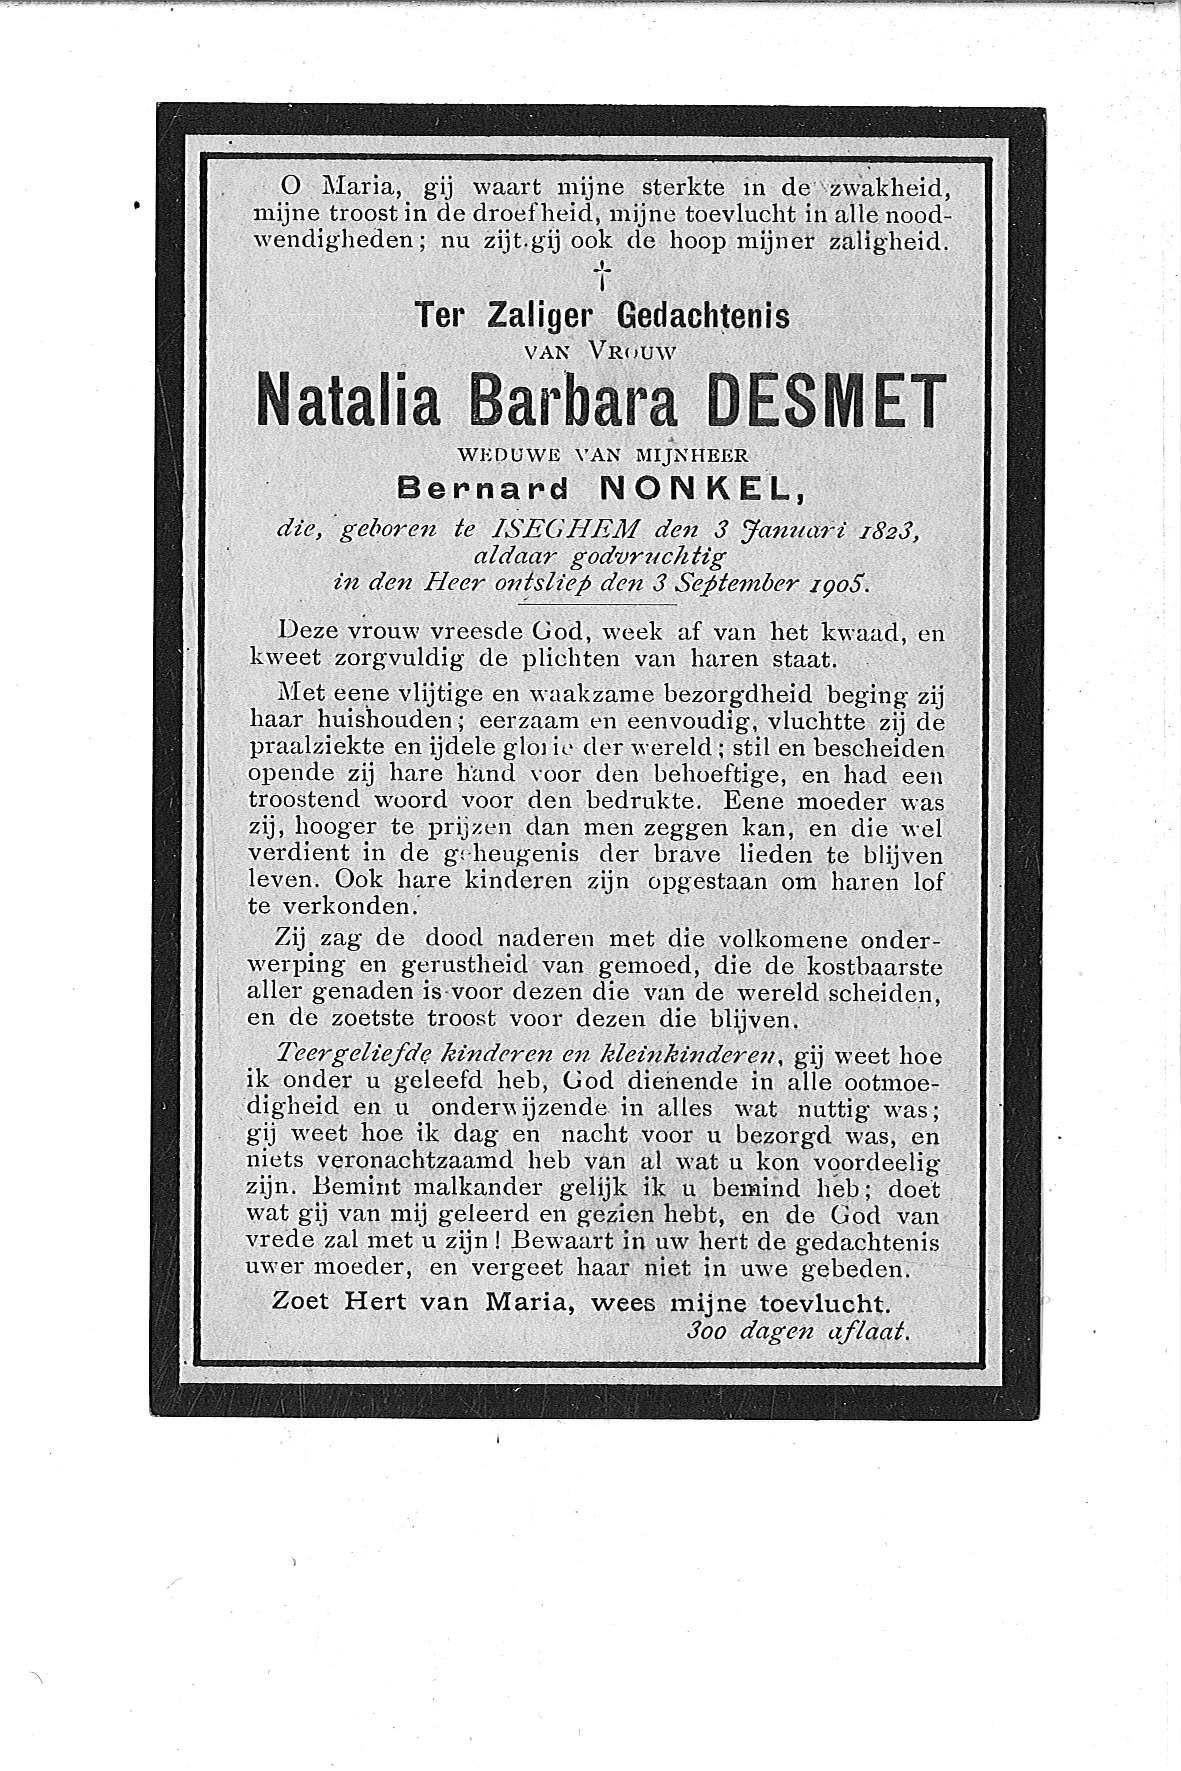 Natalia Barbara (1905) 20120504095506_00189.jpg